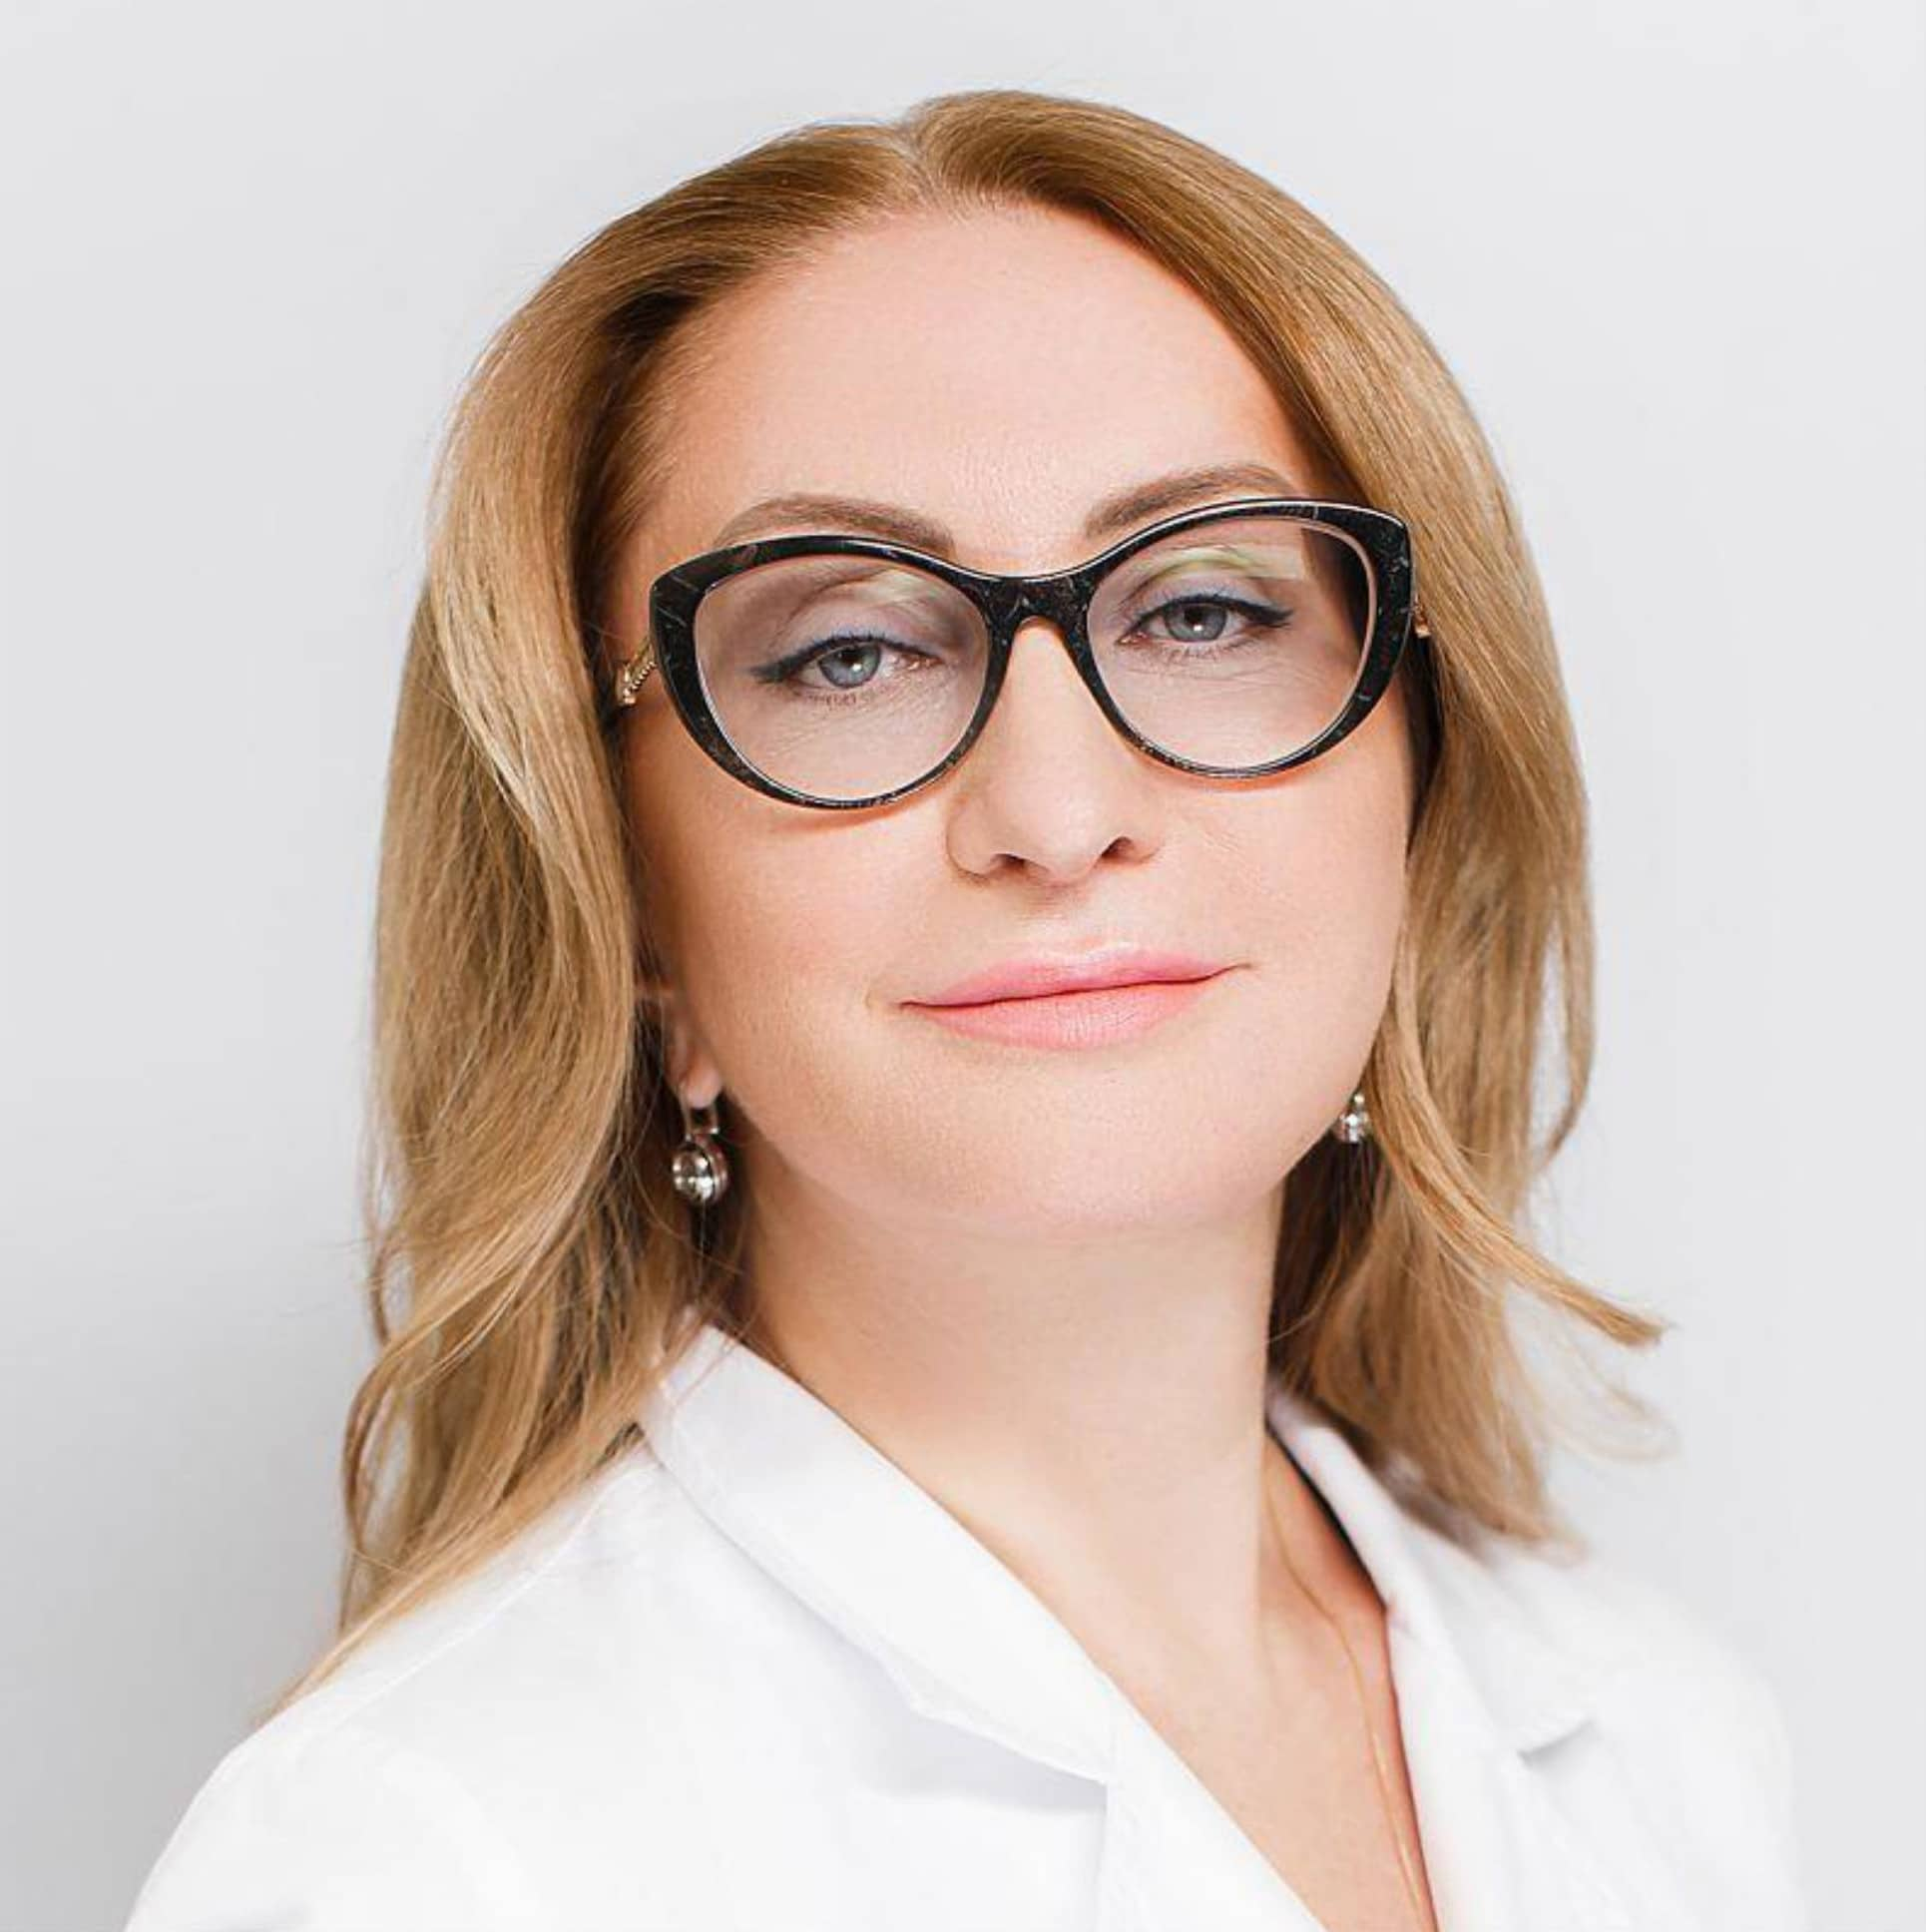 MD, Professor, Medical Director - Alla Kalugina